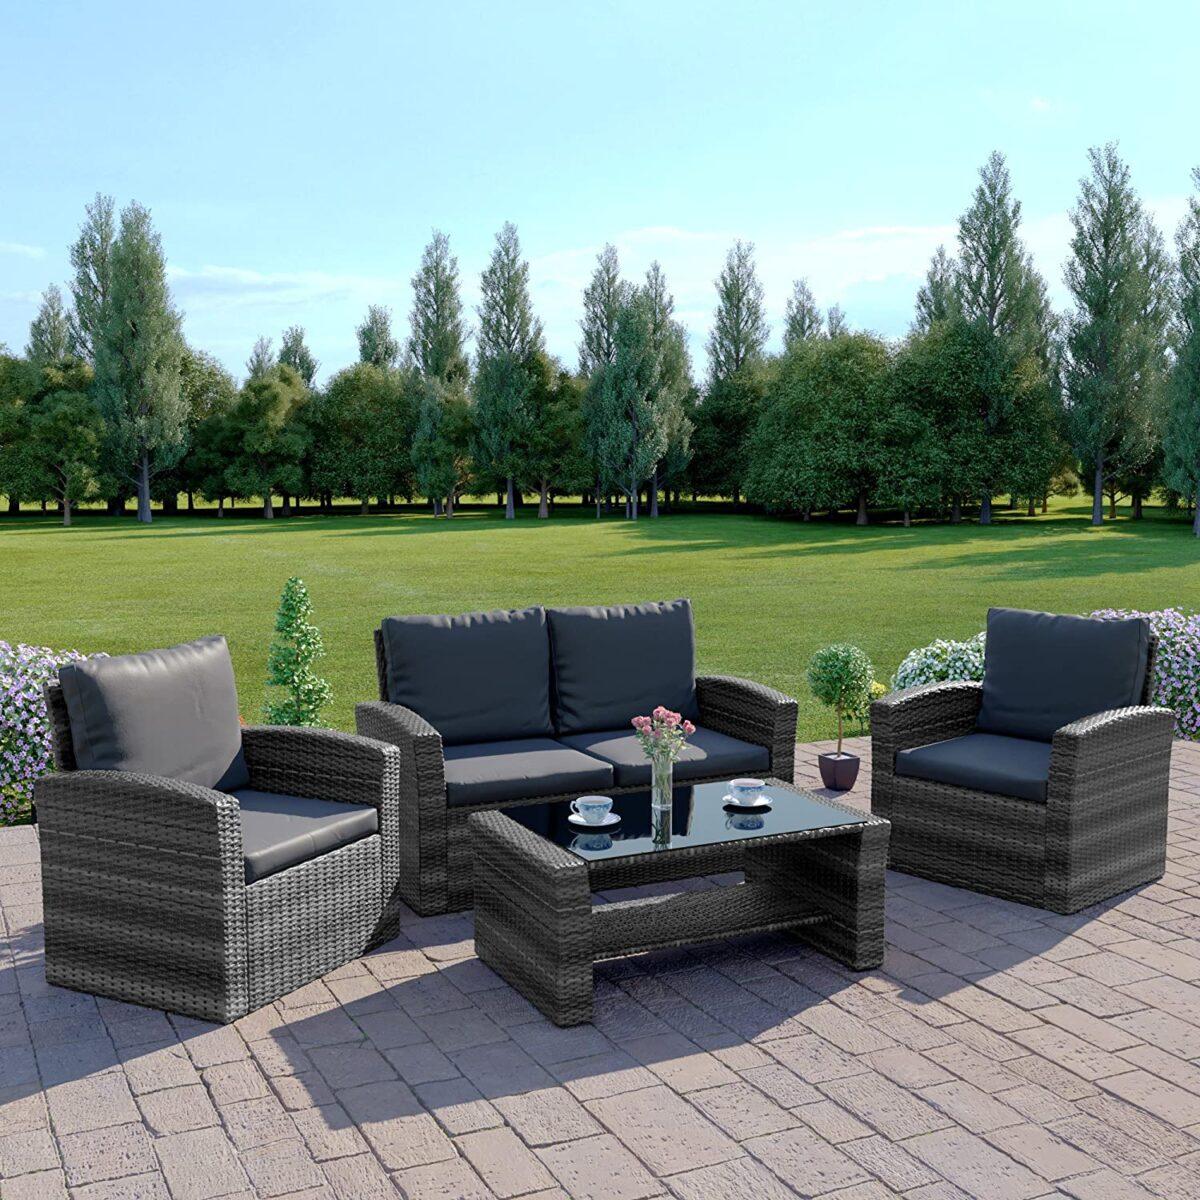 garden-furniture-trends-2021-21